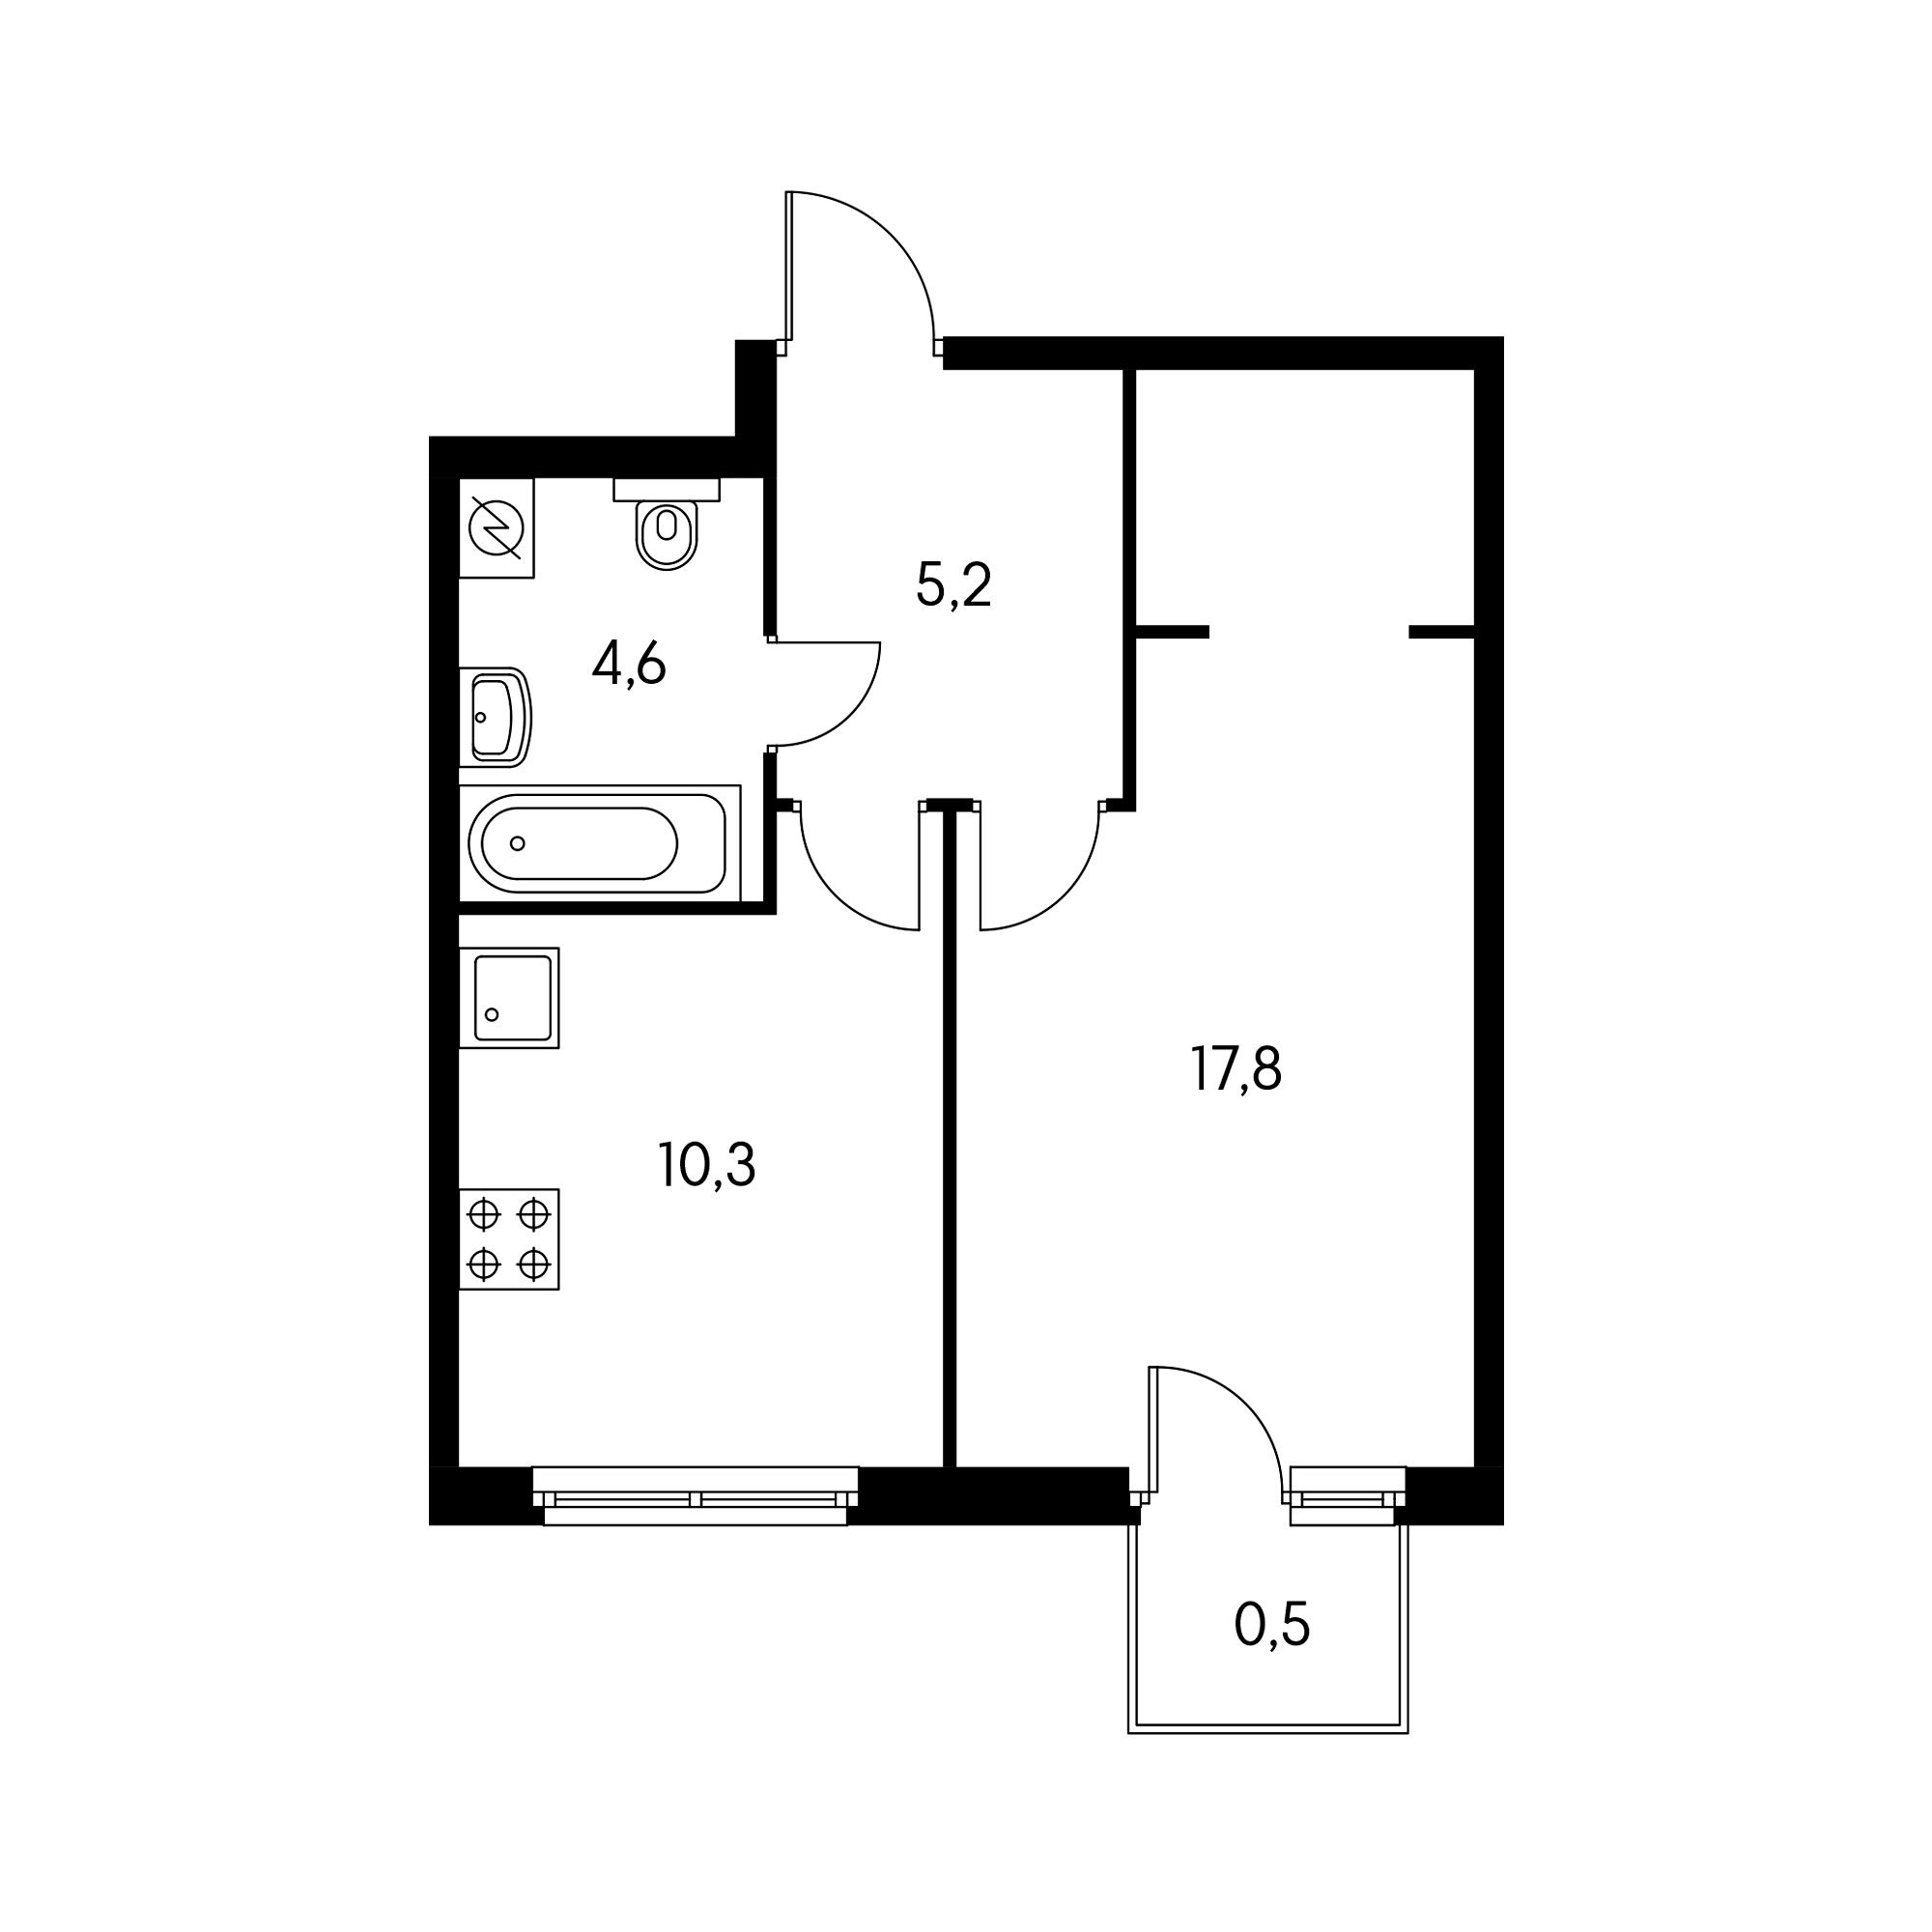 1KM2_B2